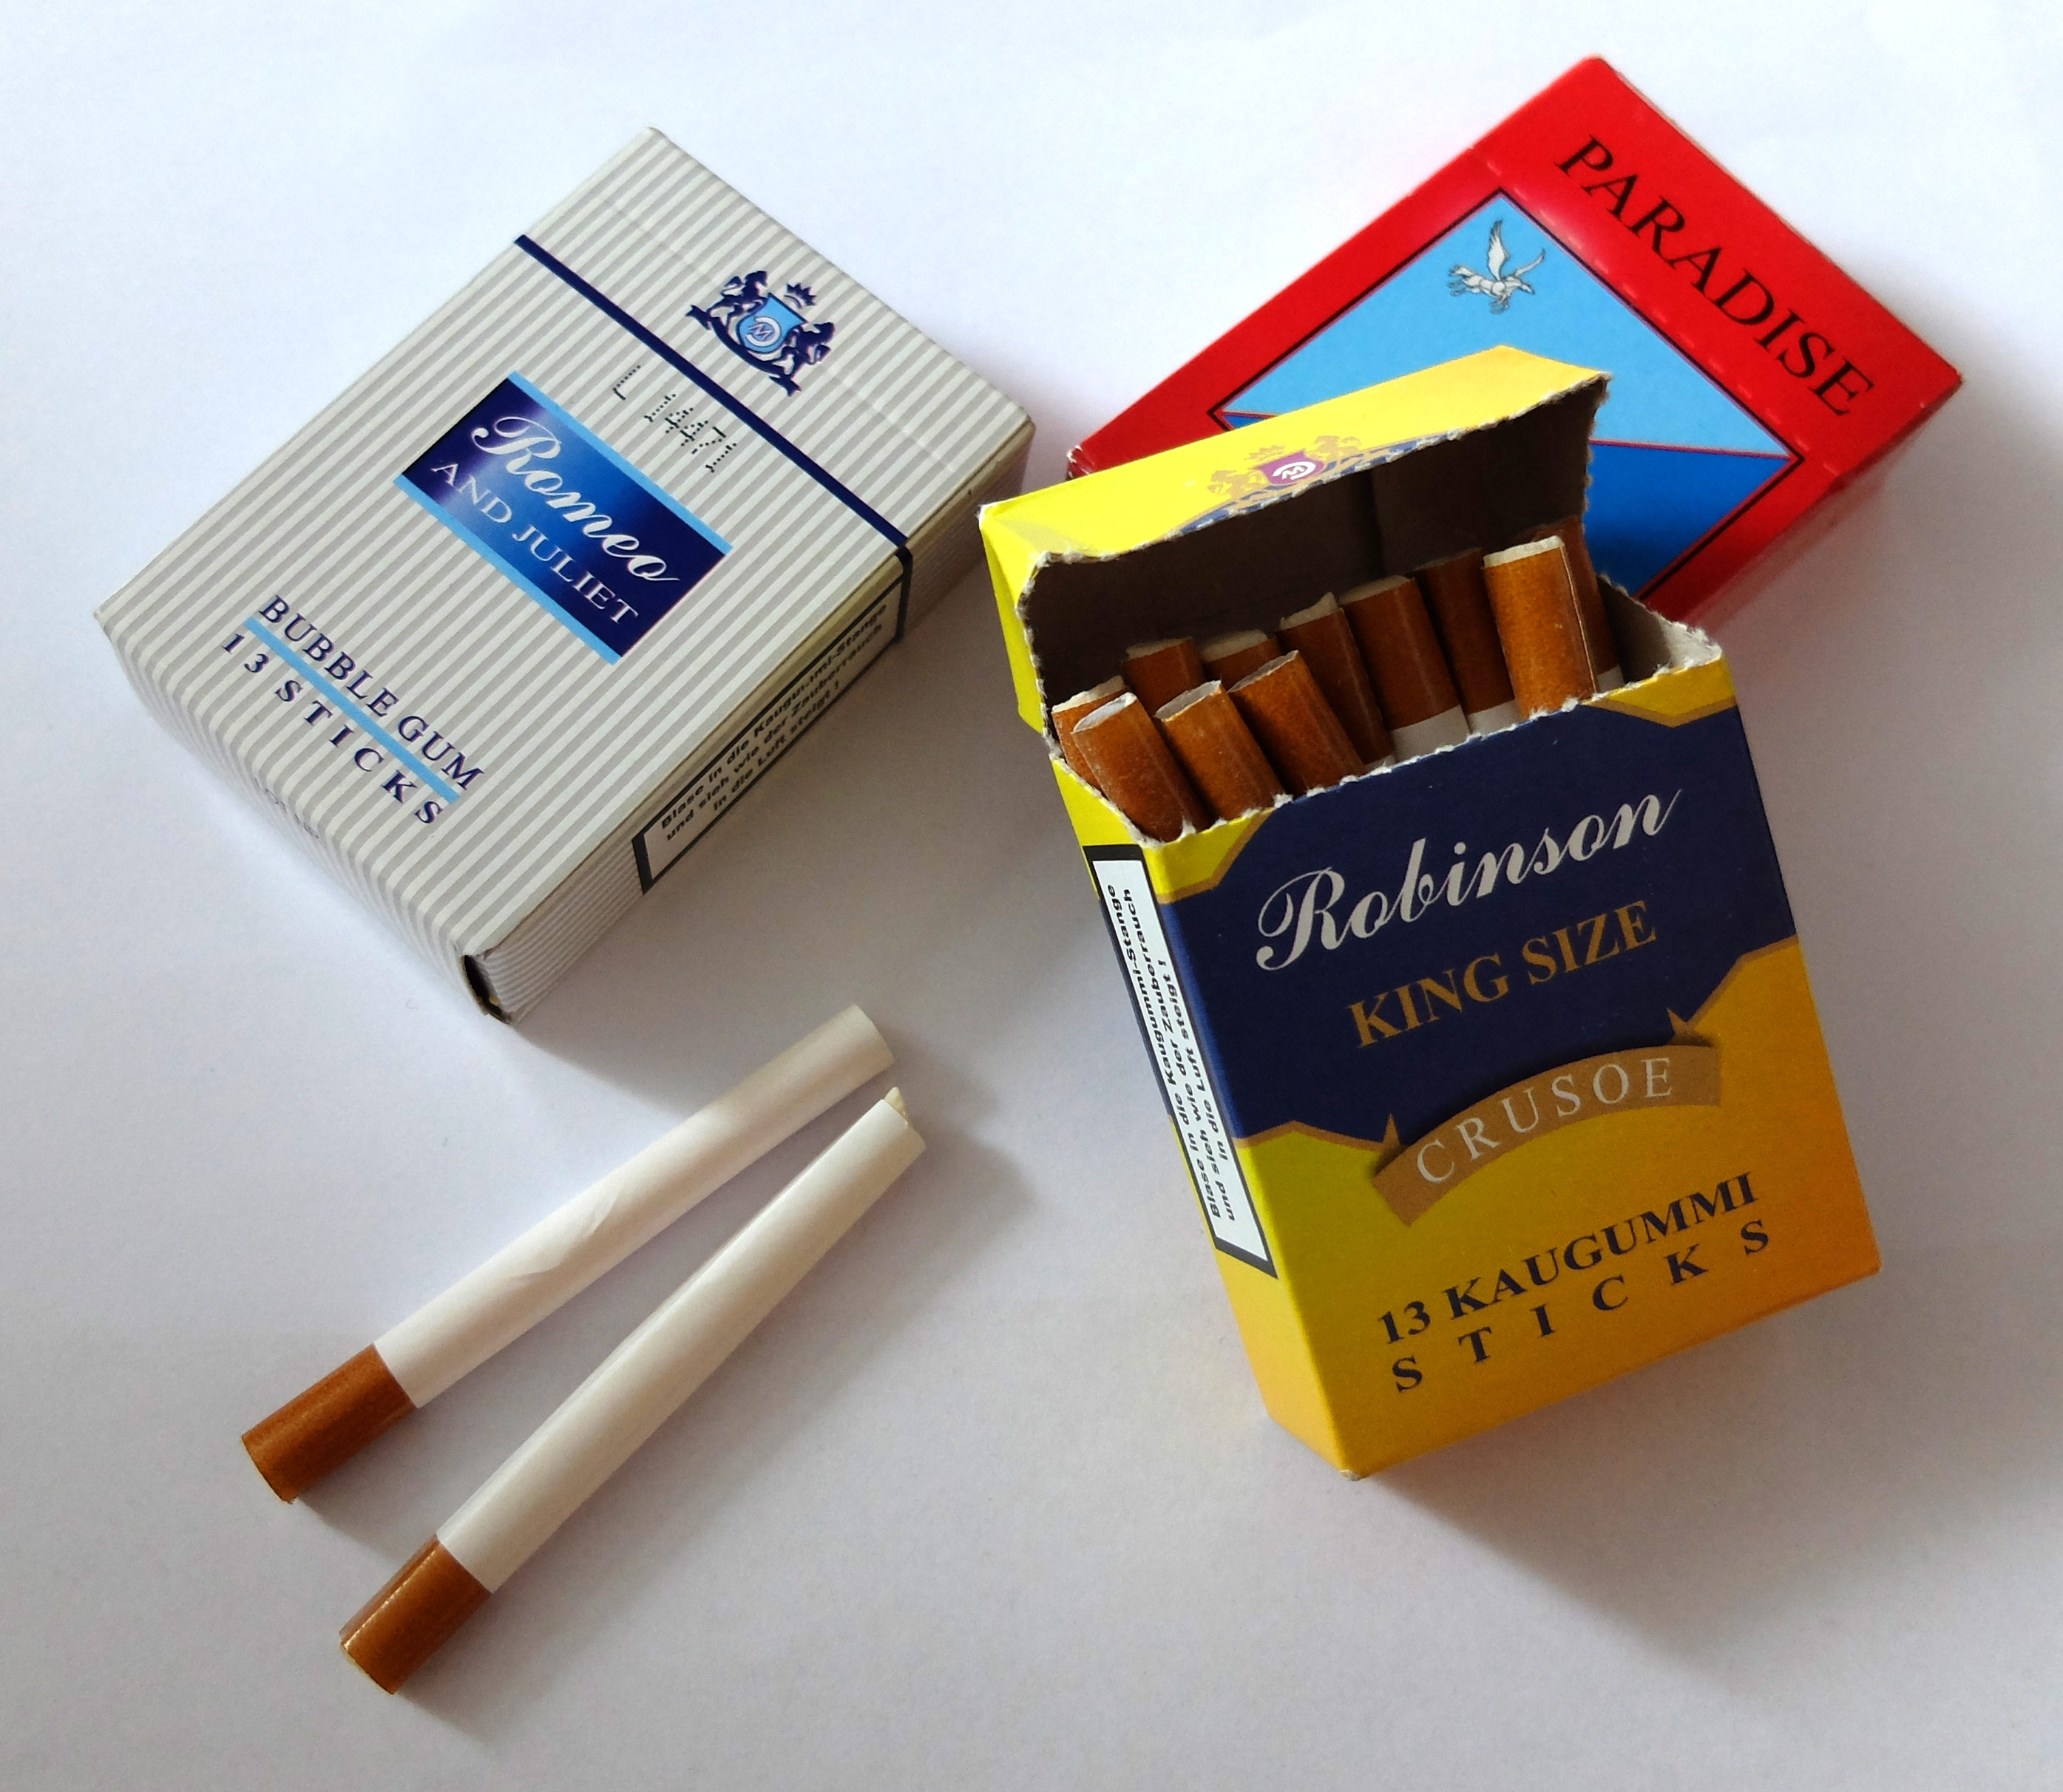 Acheter des cigarette en ligne